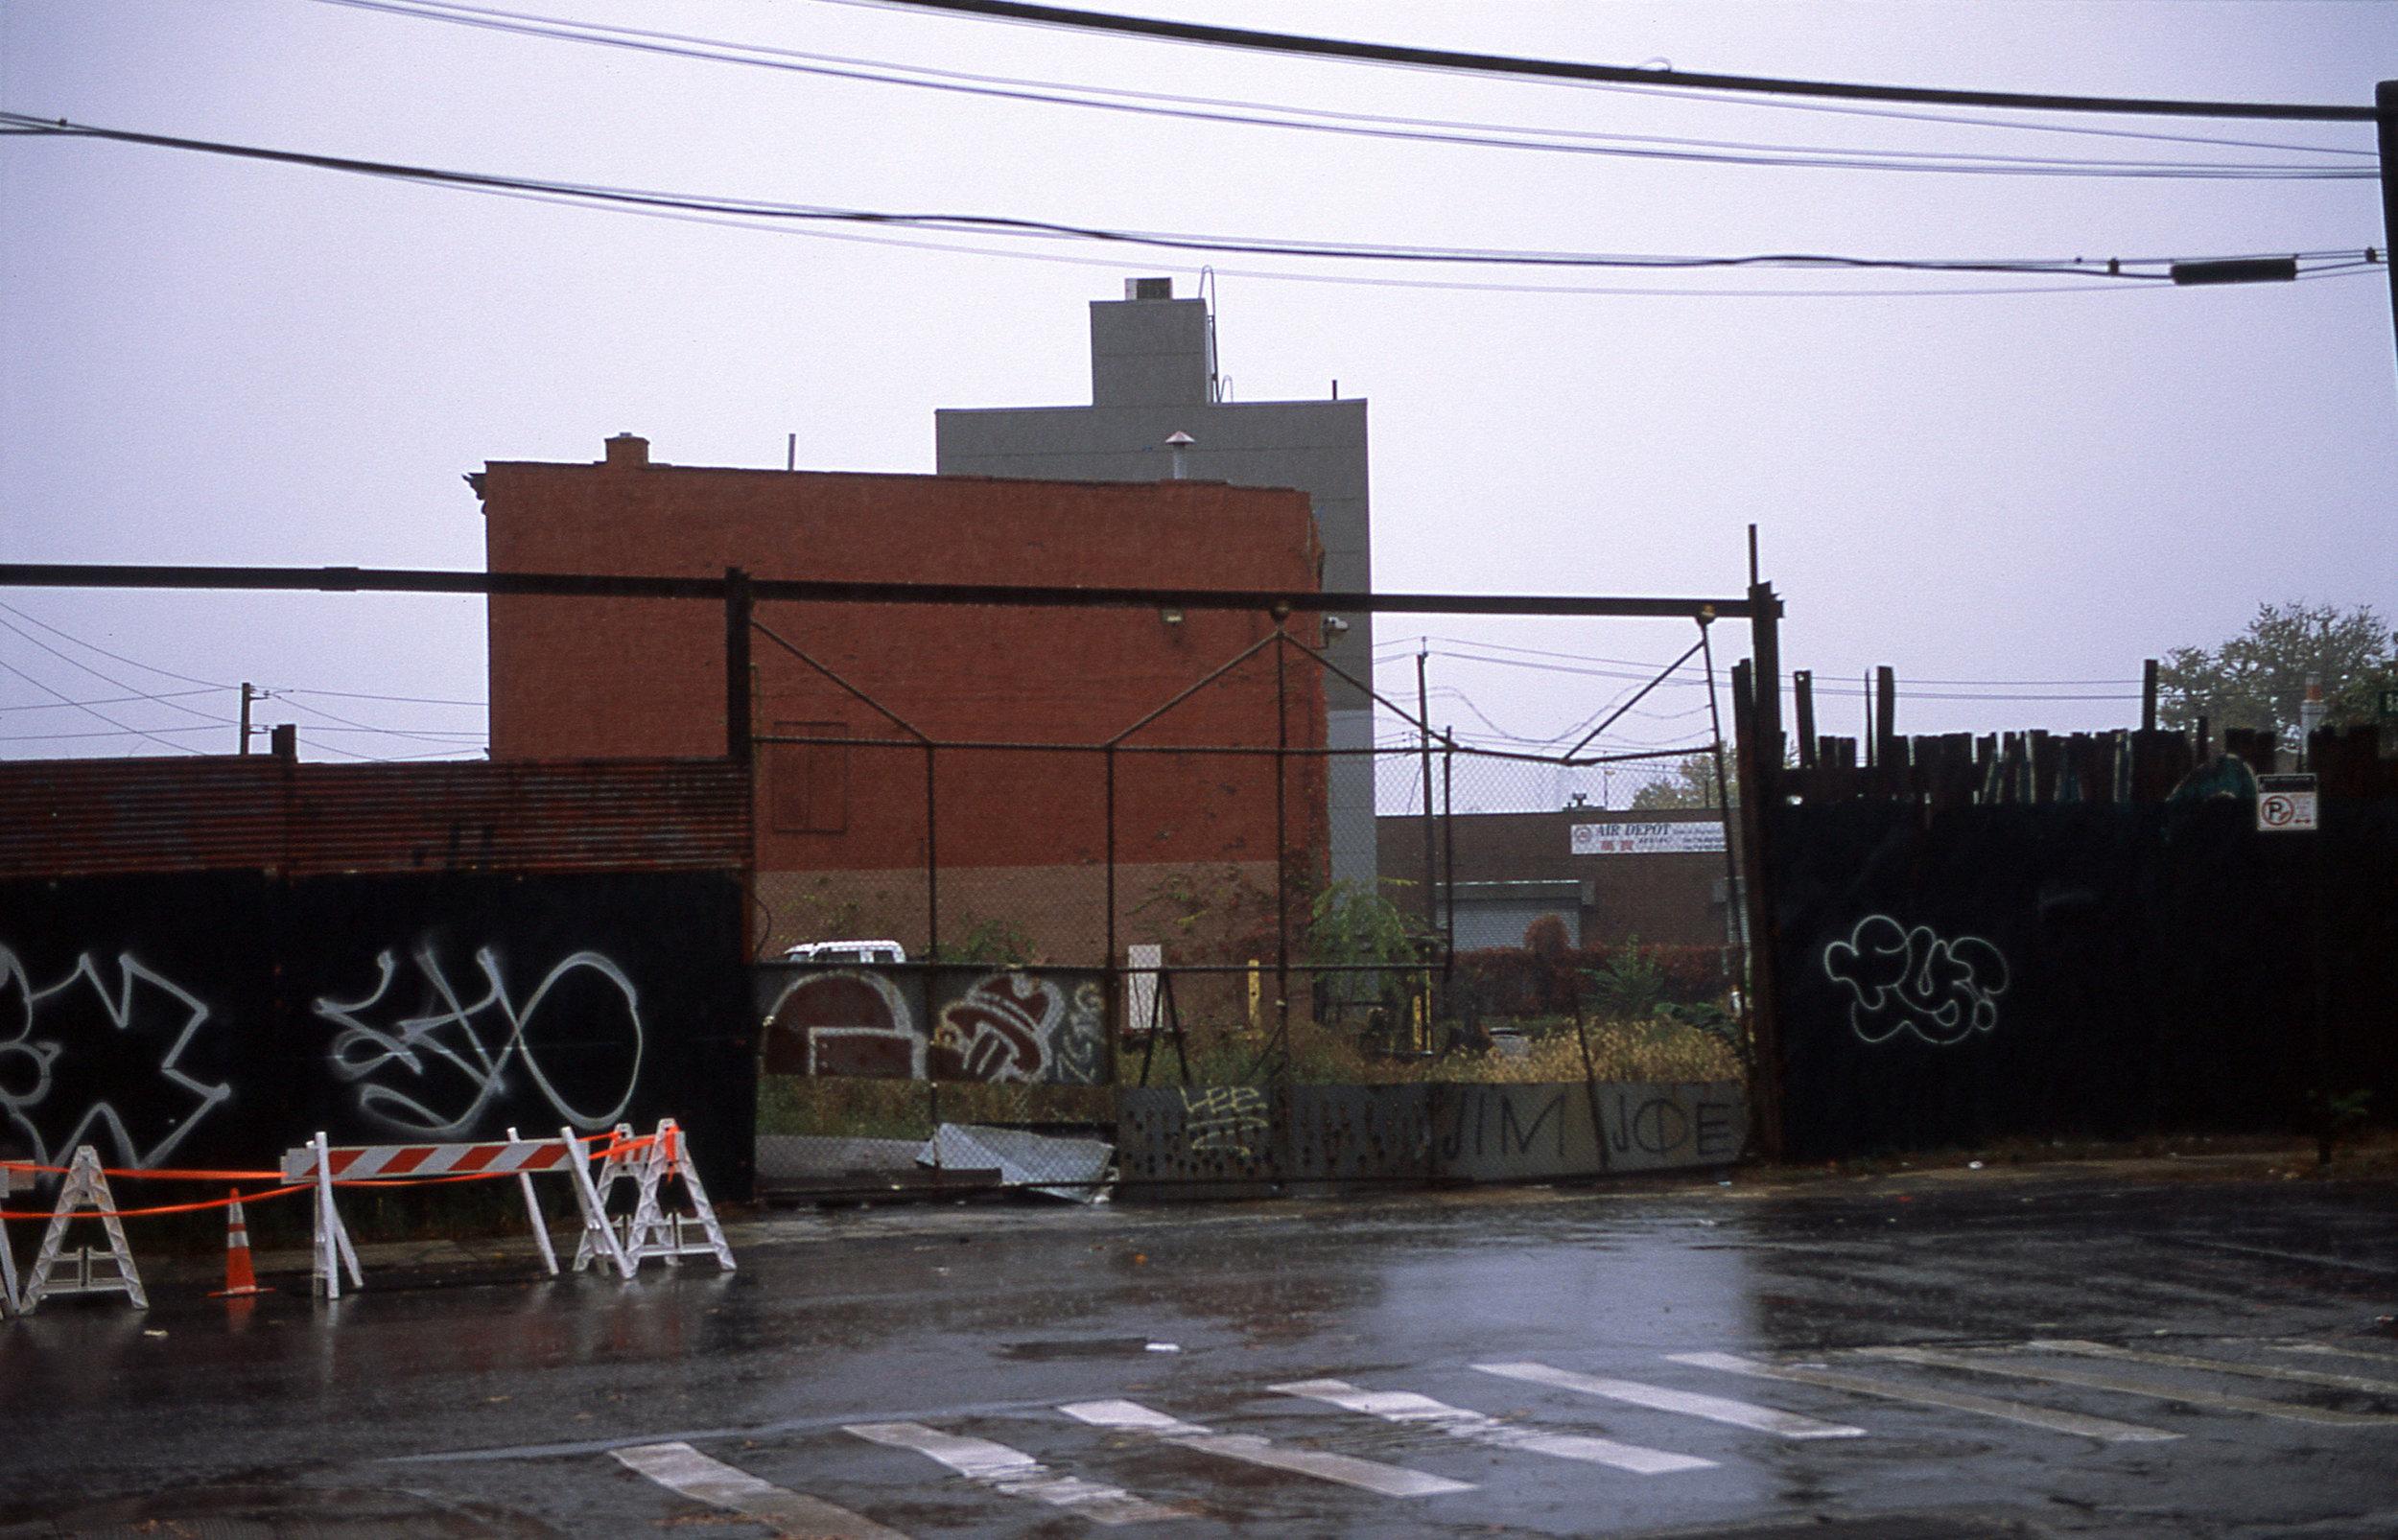 171215_NYC_Oct-Dec_012.jpg